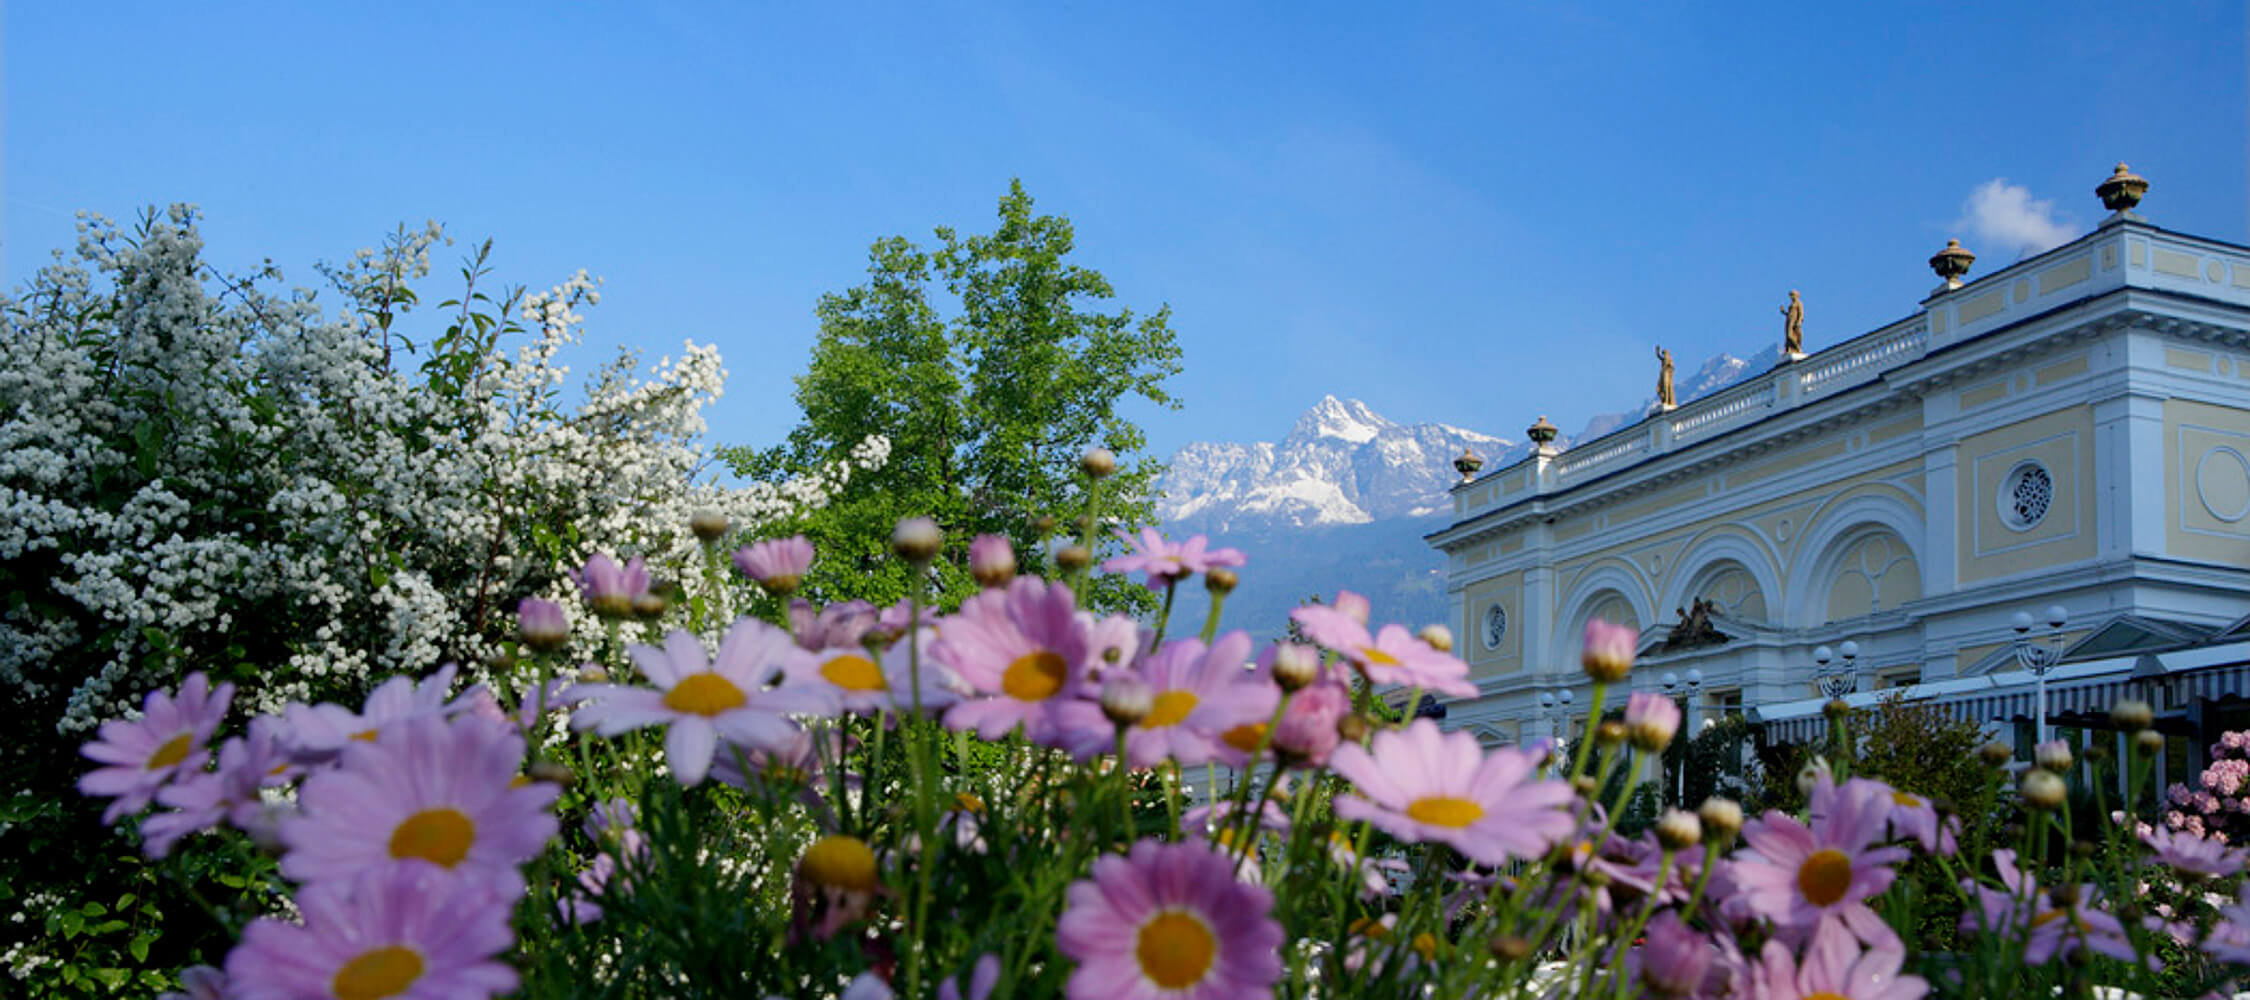 Italien-Trentino_Suedtirol_Alto_Adige_Merano_Meran_Besichtigen_Natur_Promenade_Kurhaus_Spring_Kurverwaltung_2250x1000